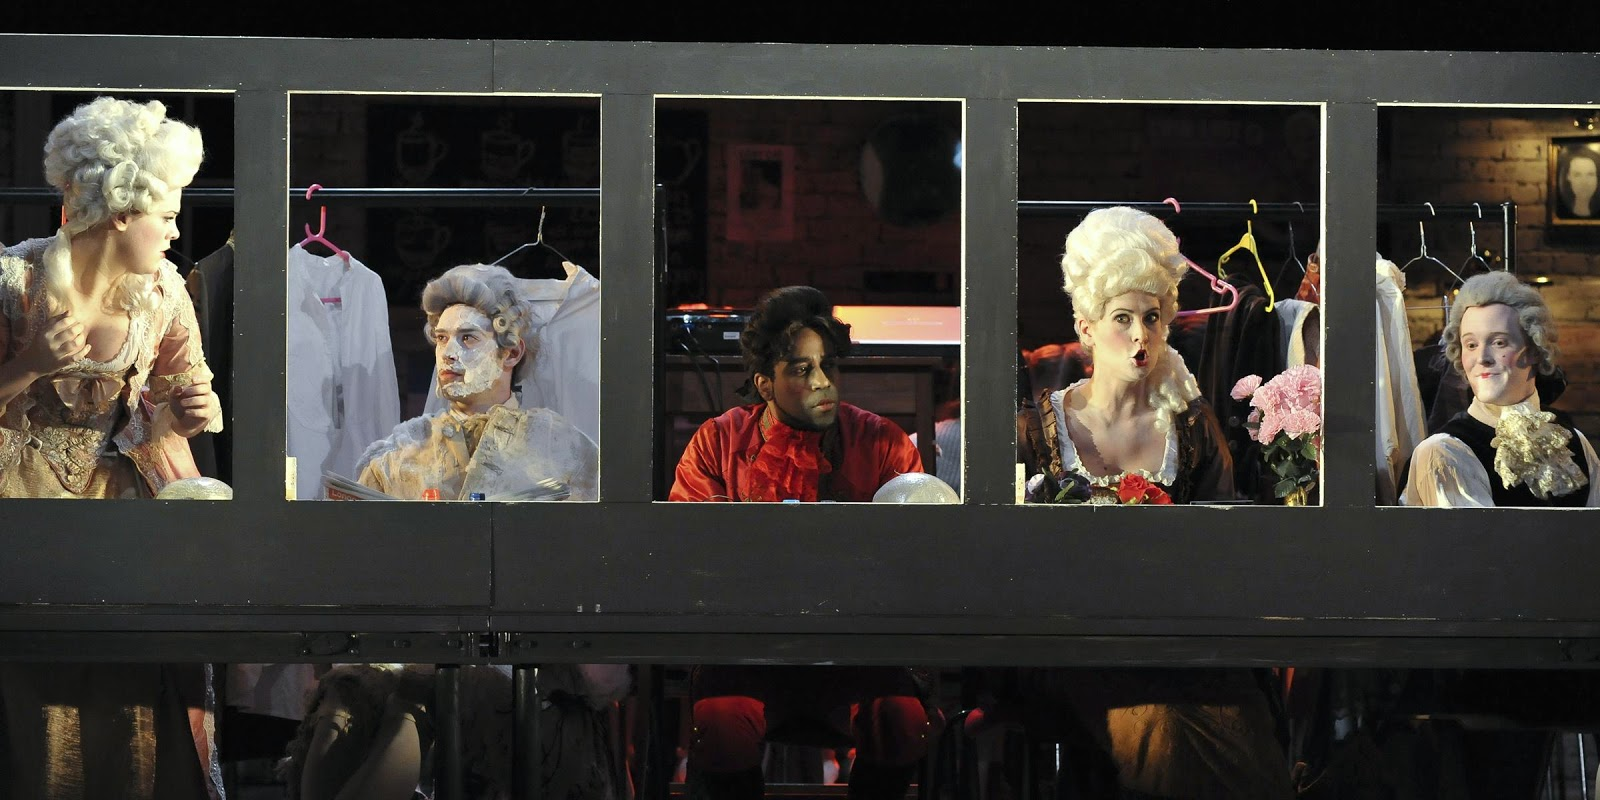 'Hogarth's bastards': Gemma Summerfield, Craig Jackson, Tai Oney, Rannveig Káradóttir, and Simon Grange. Photo credit: Fiona Clarke